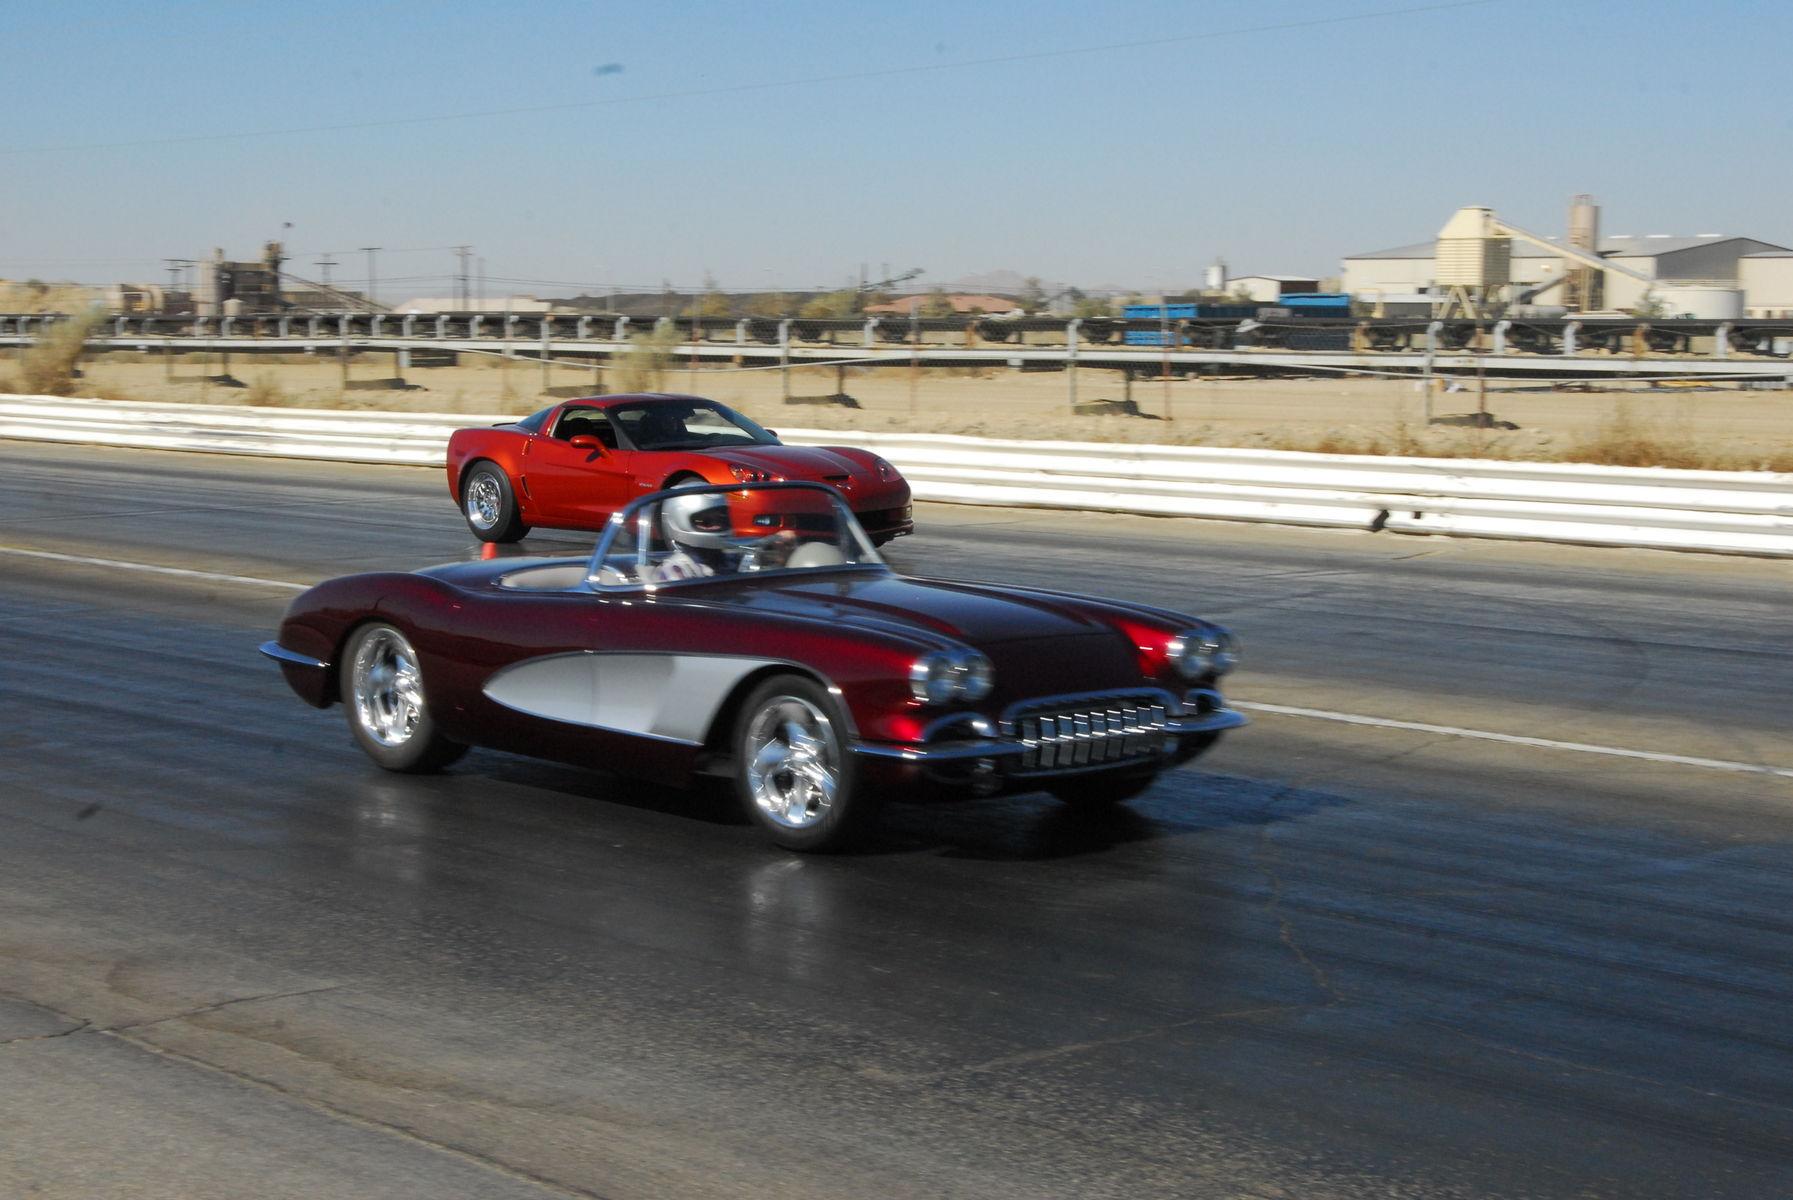 1958 Chevrolet Corvette | Casteels Father and Son Race